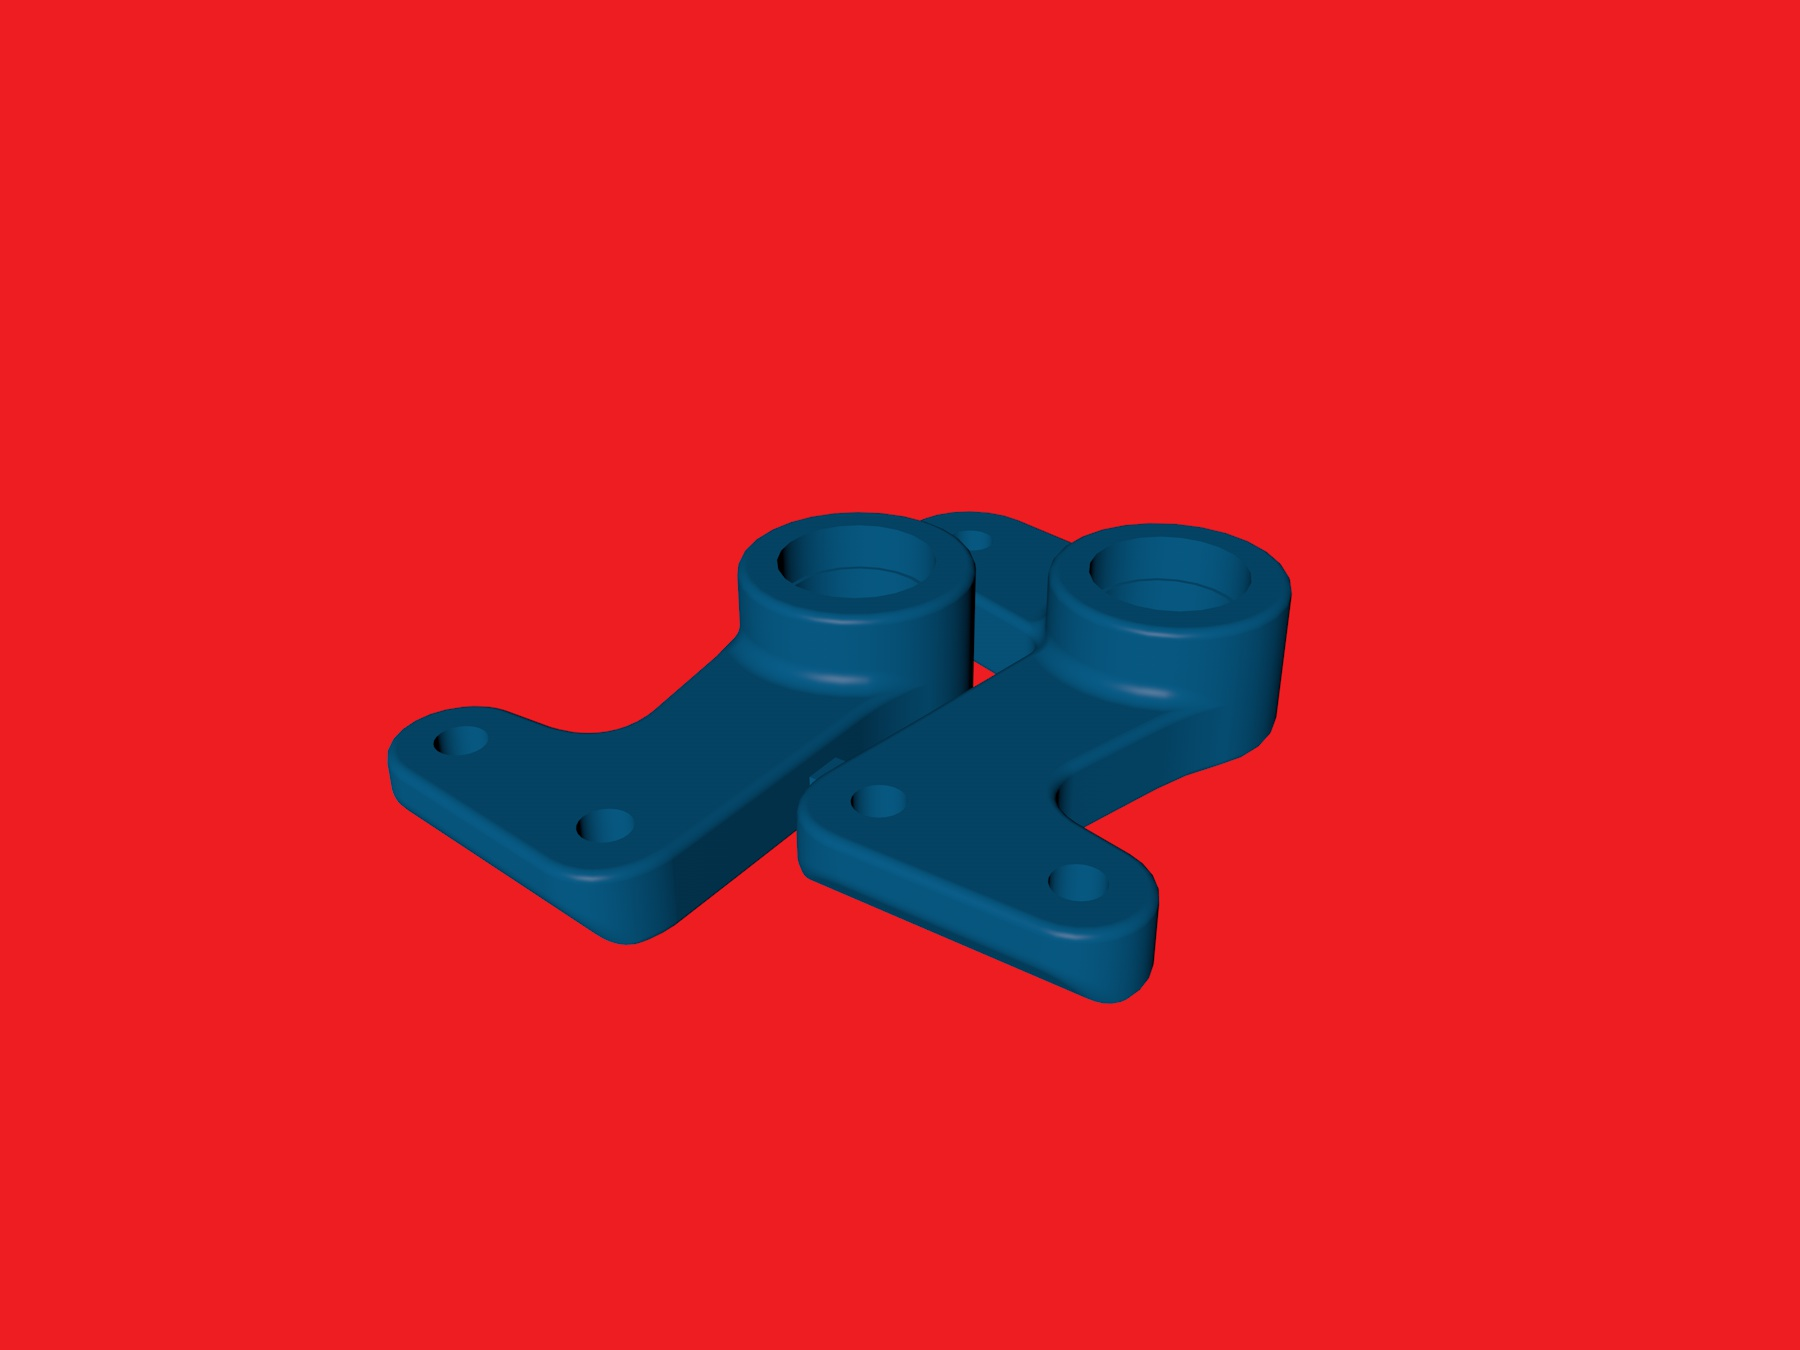 tamiya wrenchdog dyna storm dyna blaster tr-15t h3 h4 steering arms trf211x